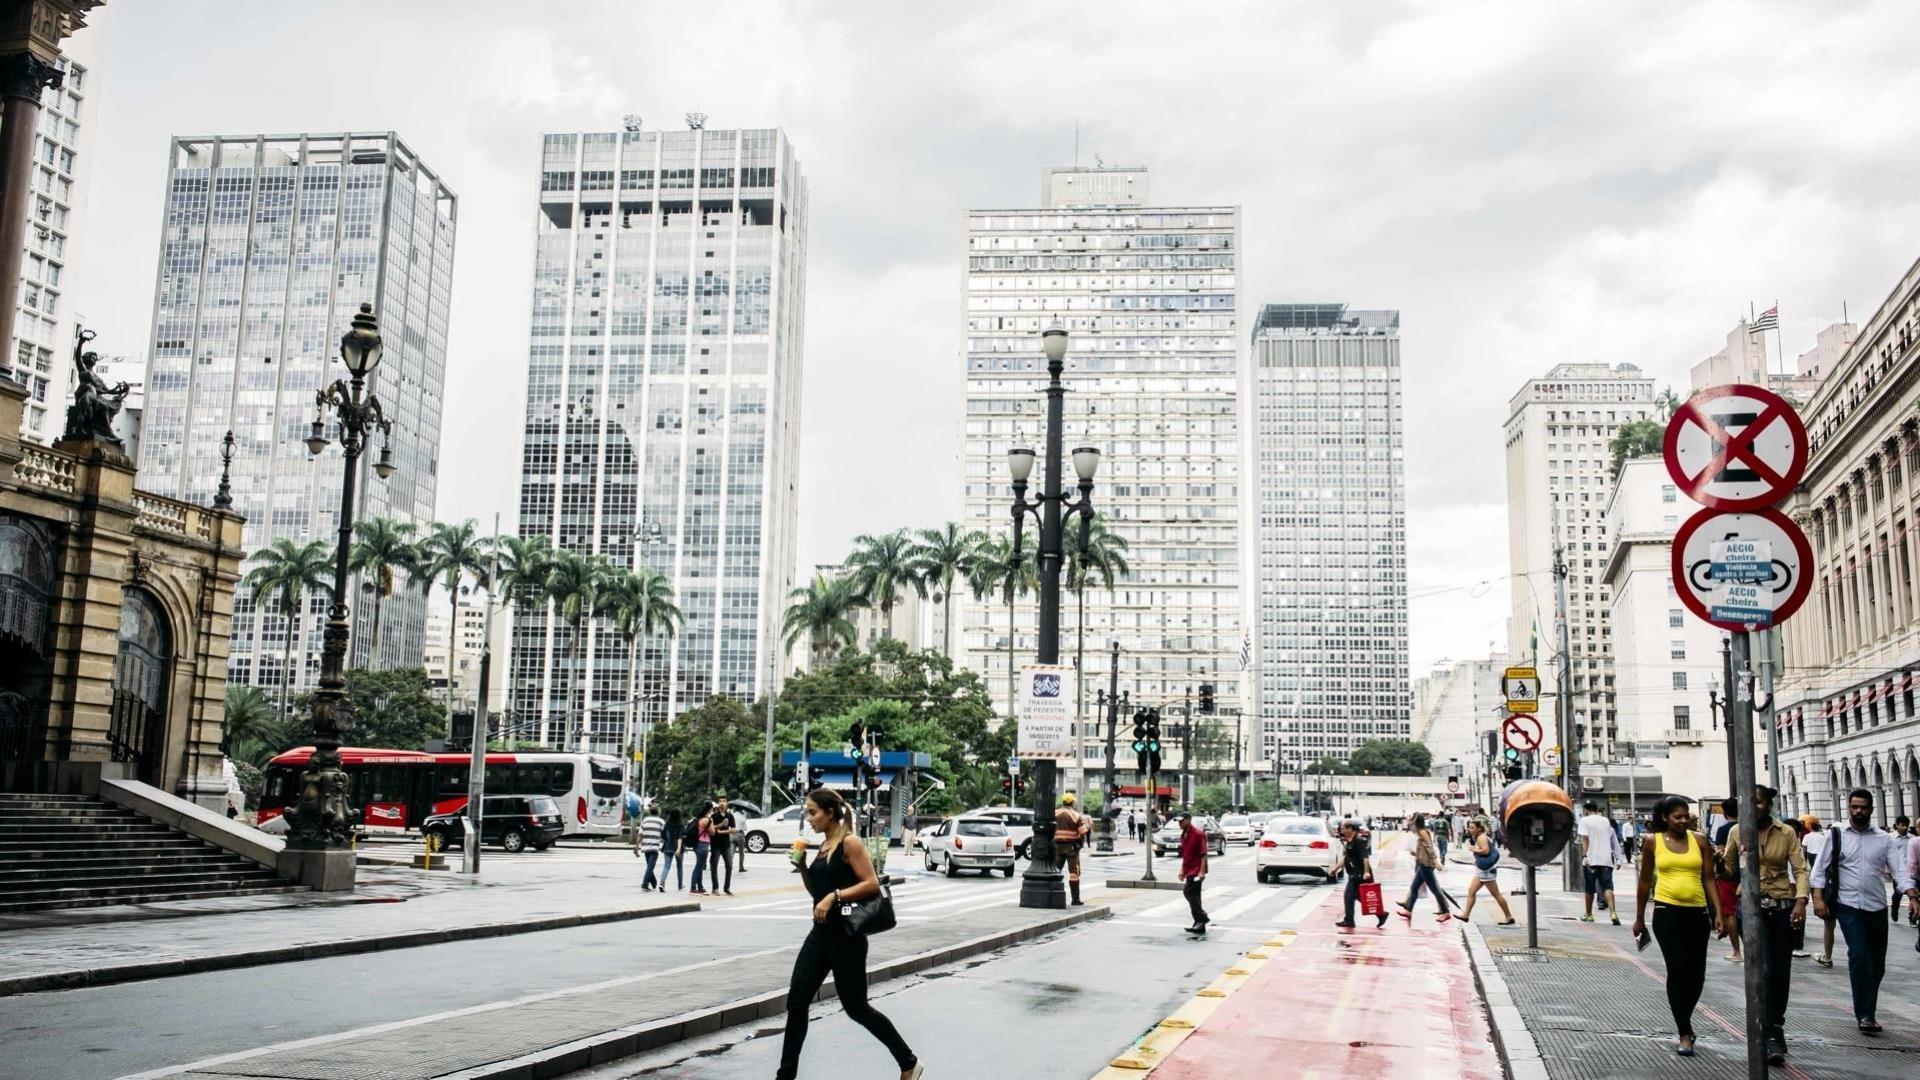 Brasilien Sao Paulo: 3 Tage Reisebaustein - Sao Paulo klassisch erleben